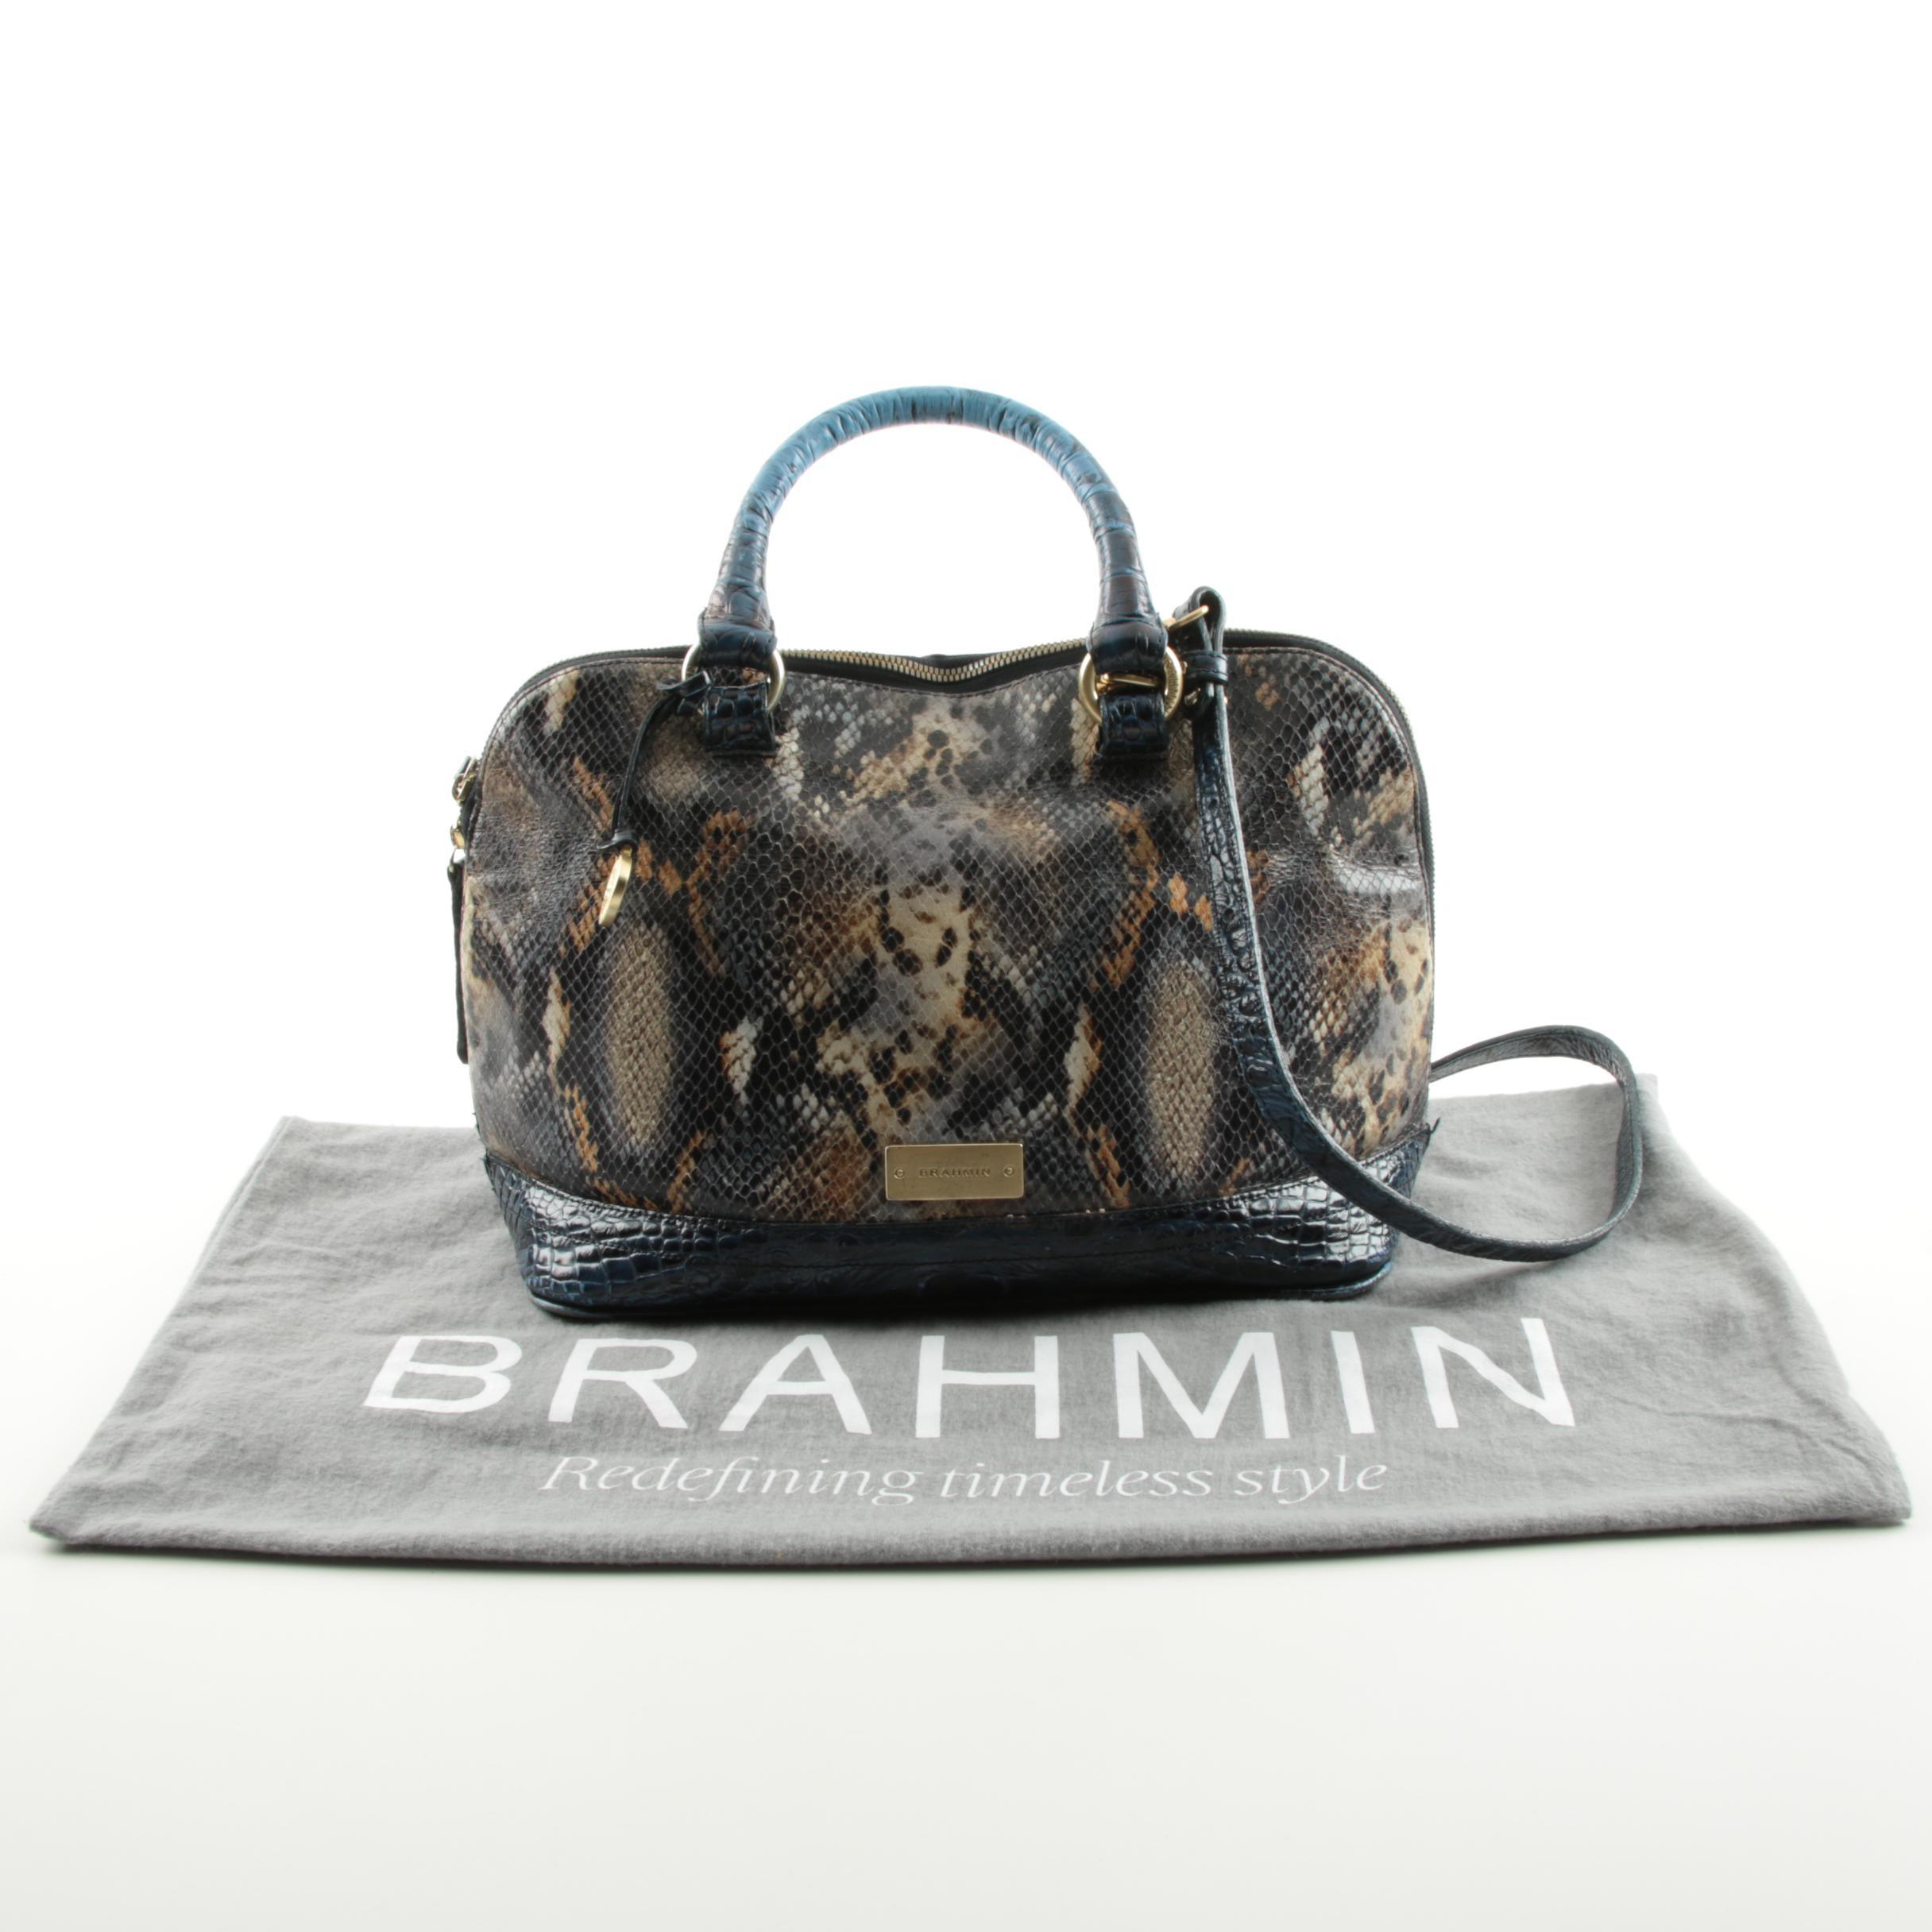 Brahmin Snakeskin Embossed Leather Handbag